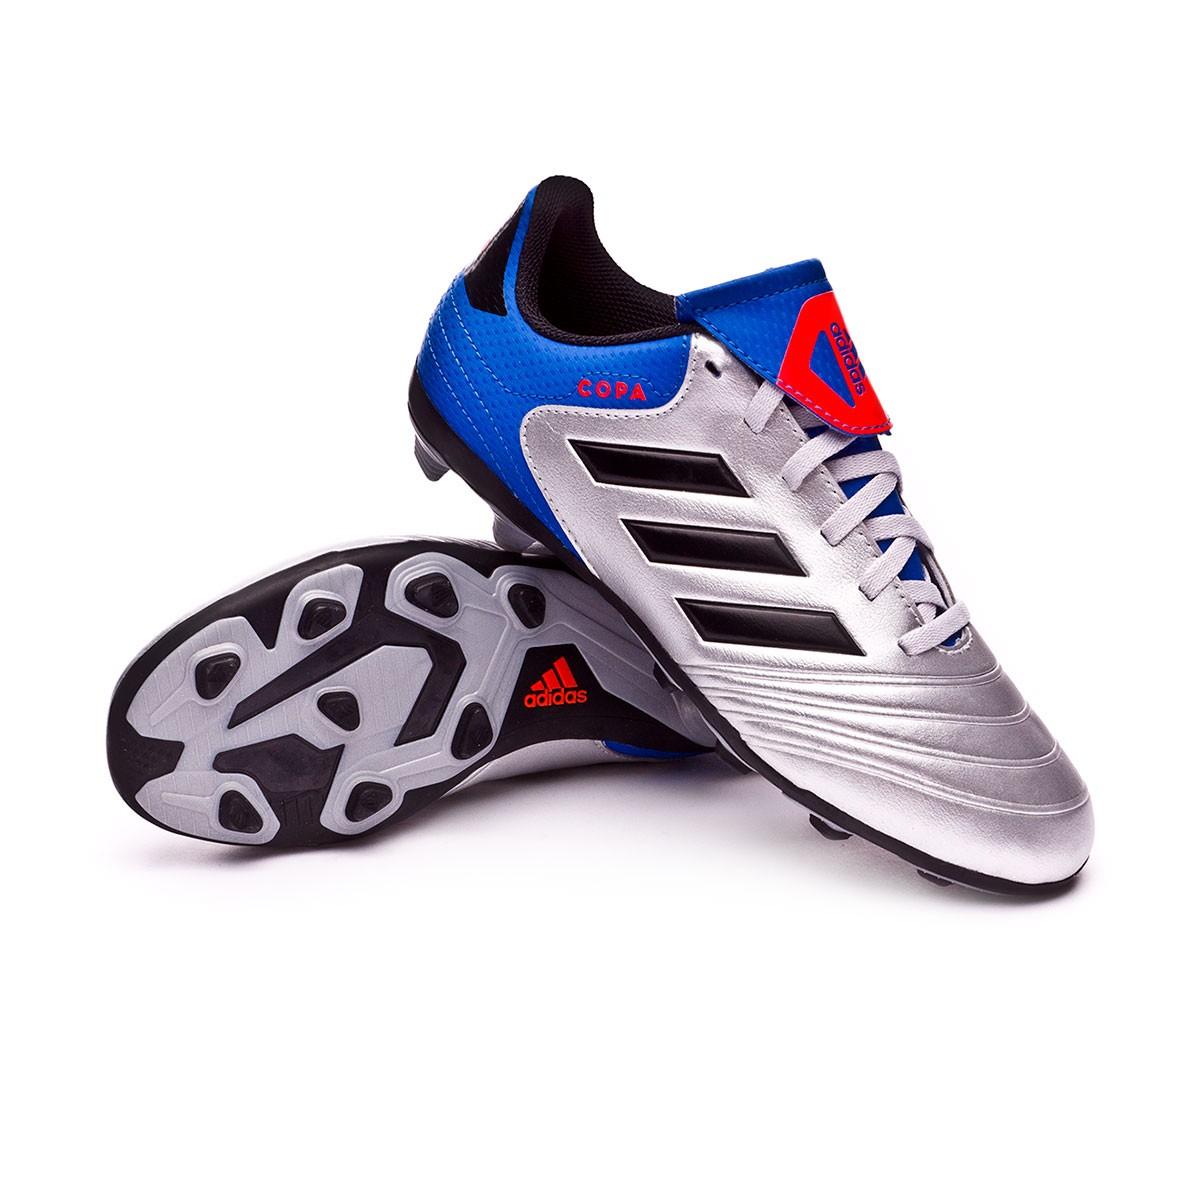 9e943f8e4a5b7 adidas Kids Copa 18.4 FxG Boot. Silver metallic-Core black-Football ...